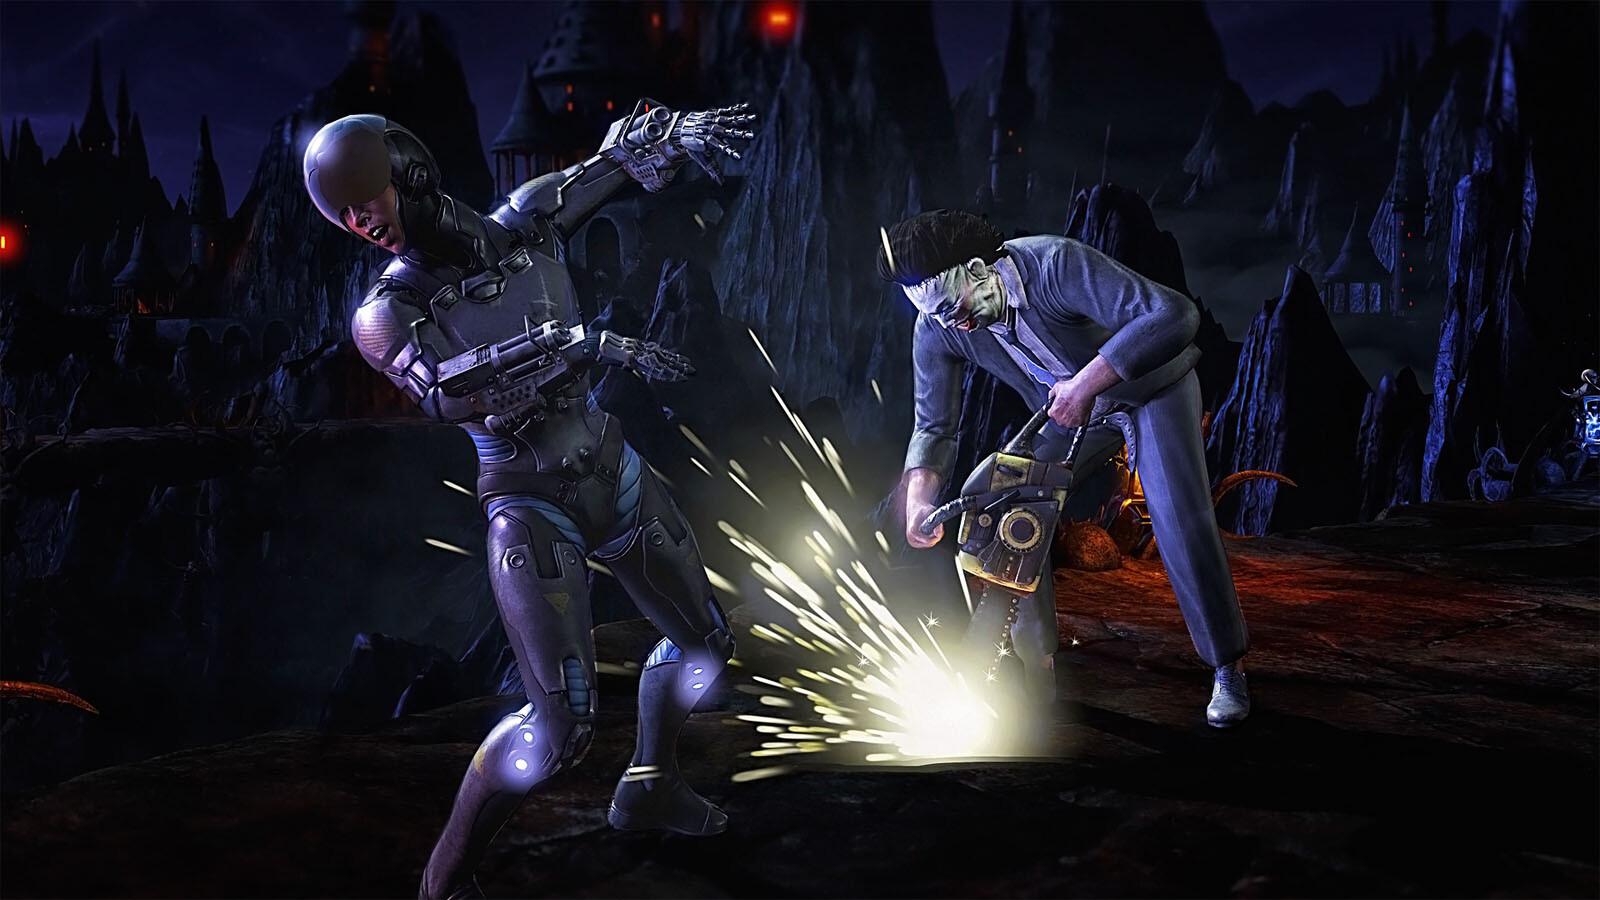 Mortal Kombat XL [Steam CD Key] for PC - Buy now